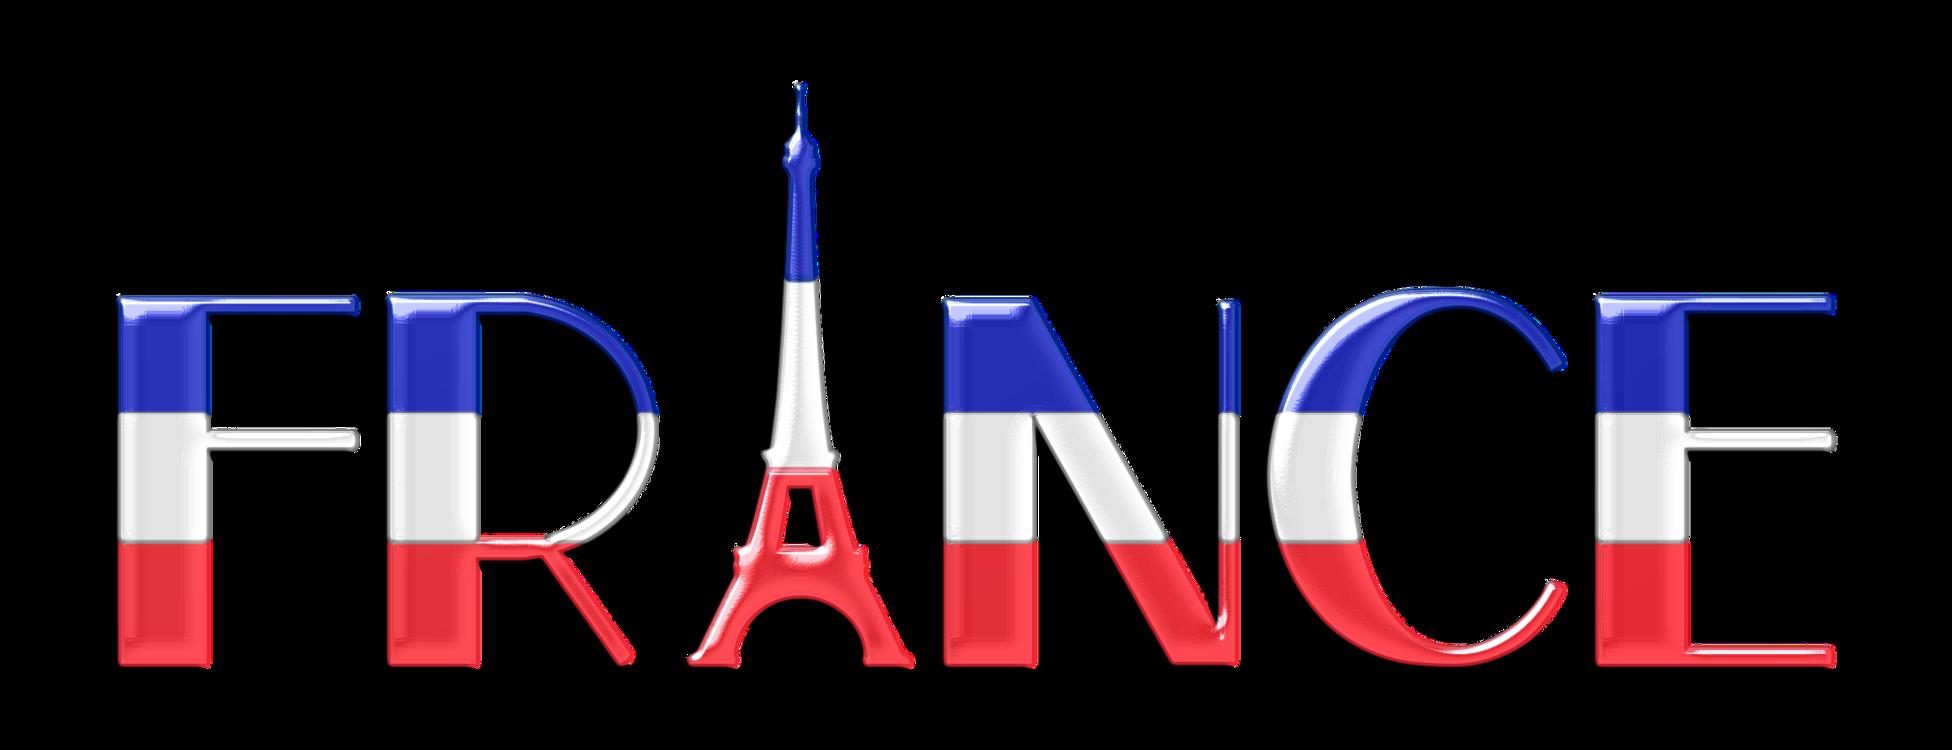 france national football team typography french language free rh kisscc0 com Free Vintage Clip Art france clip art free